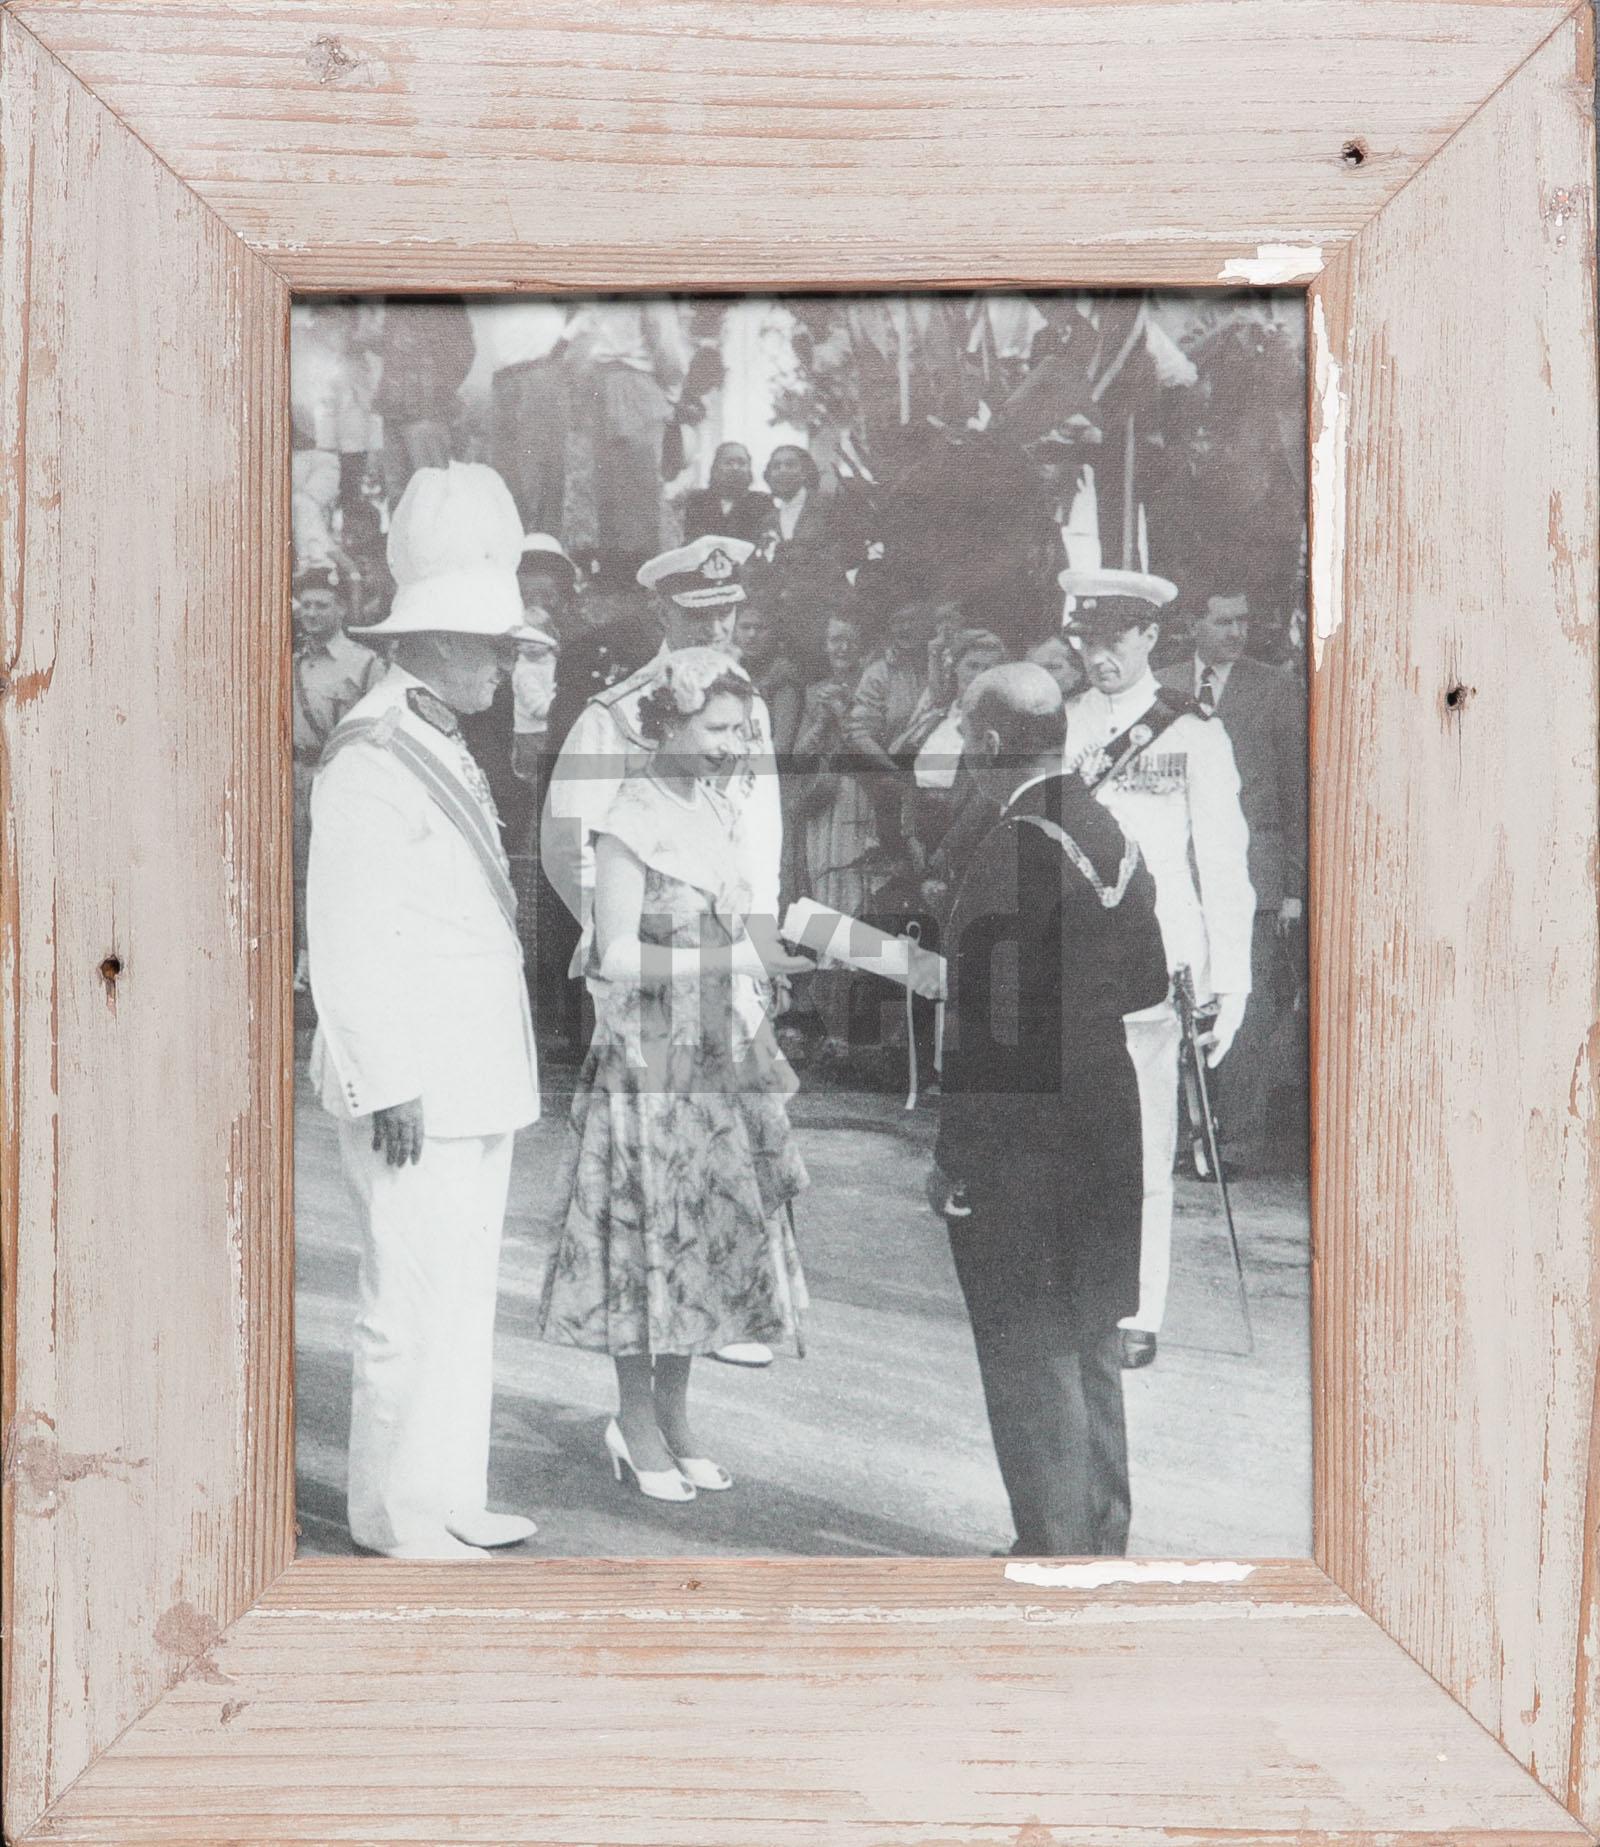 Vintage-Fotorahmen aus recyceltem Holz